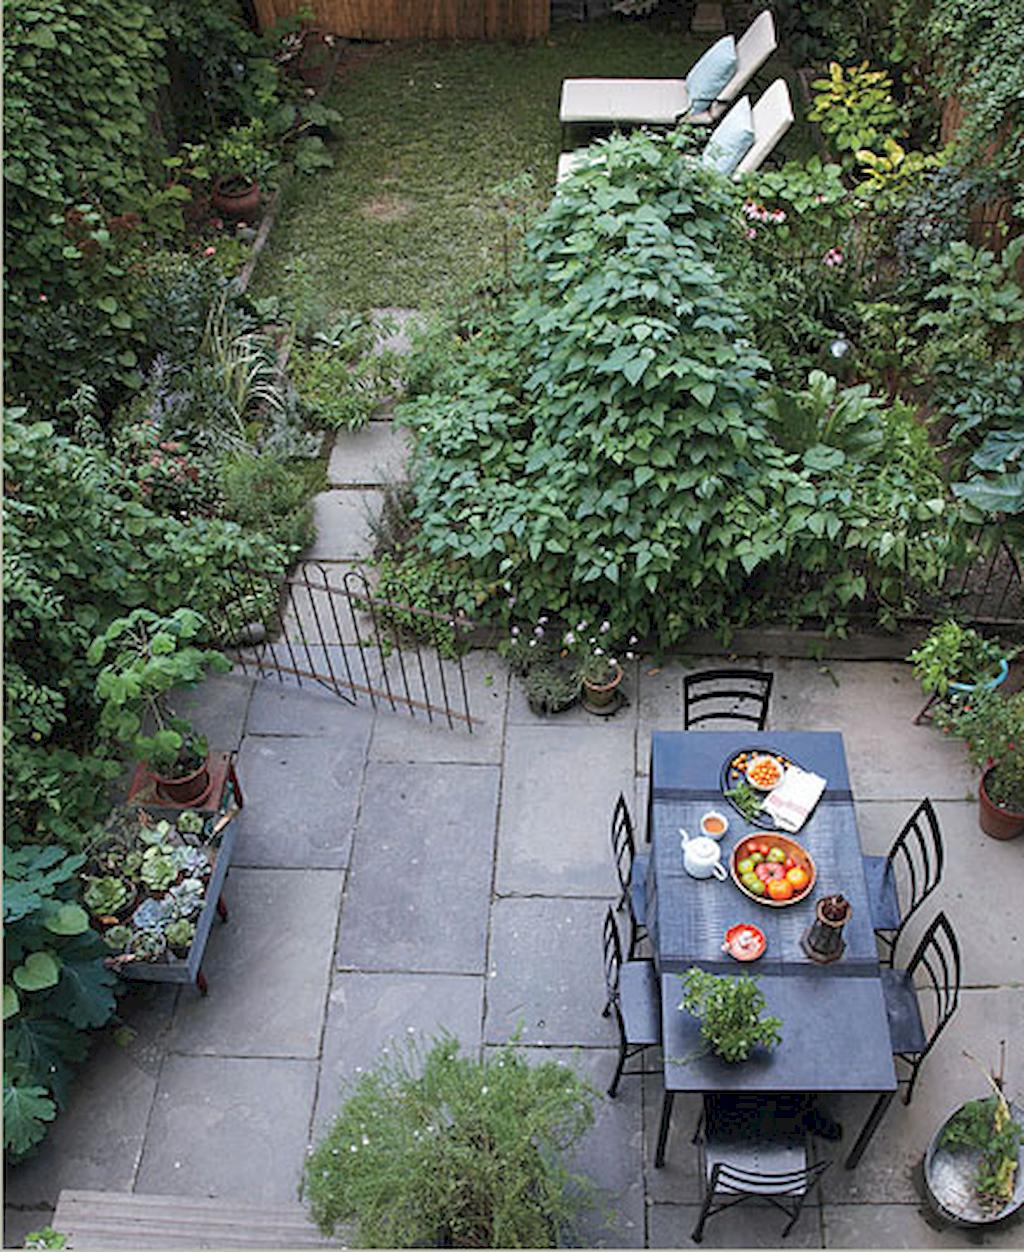 43 Awesome Large Backyard Ideas on a Budget | Large ...